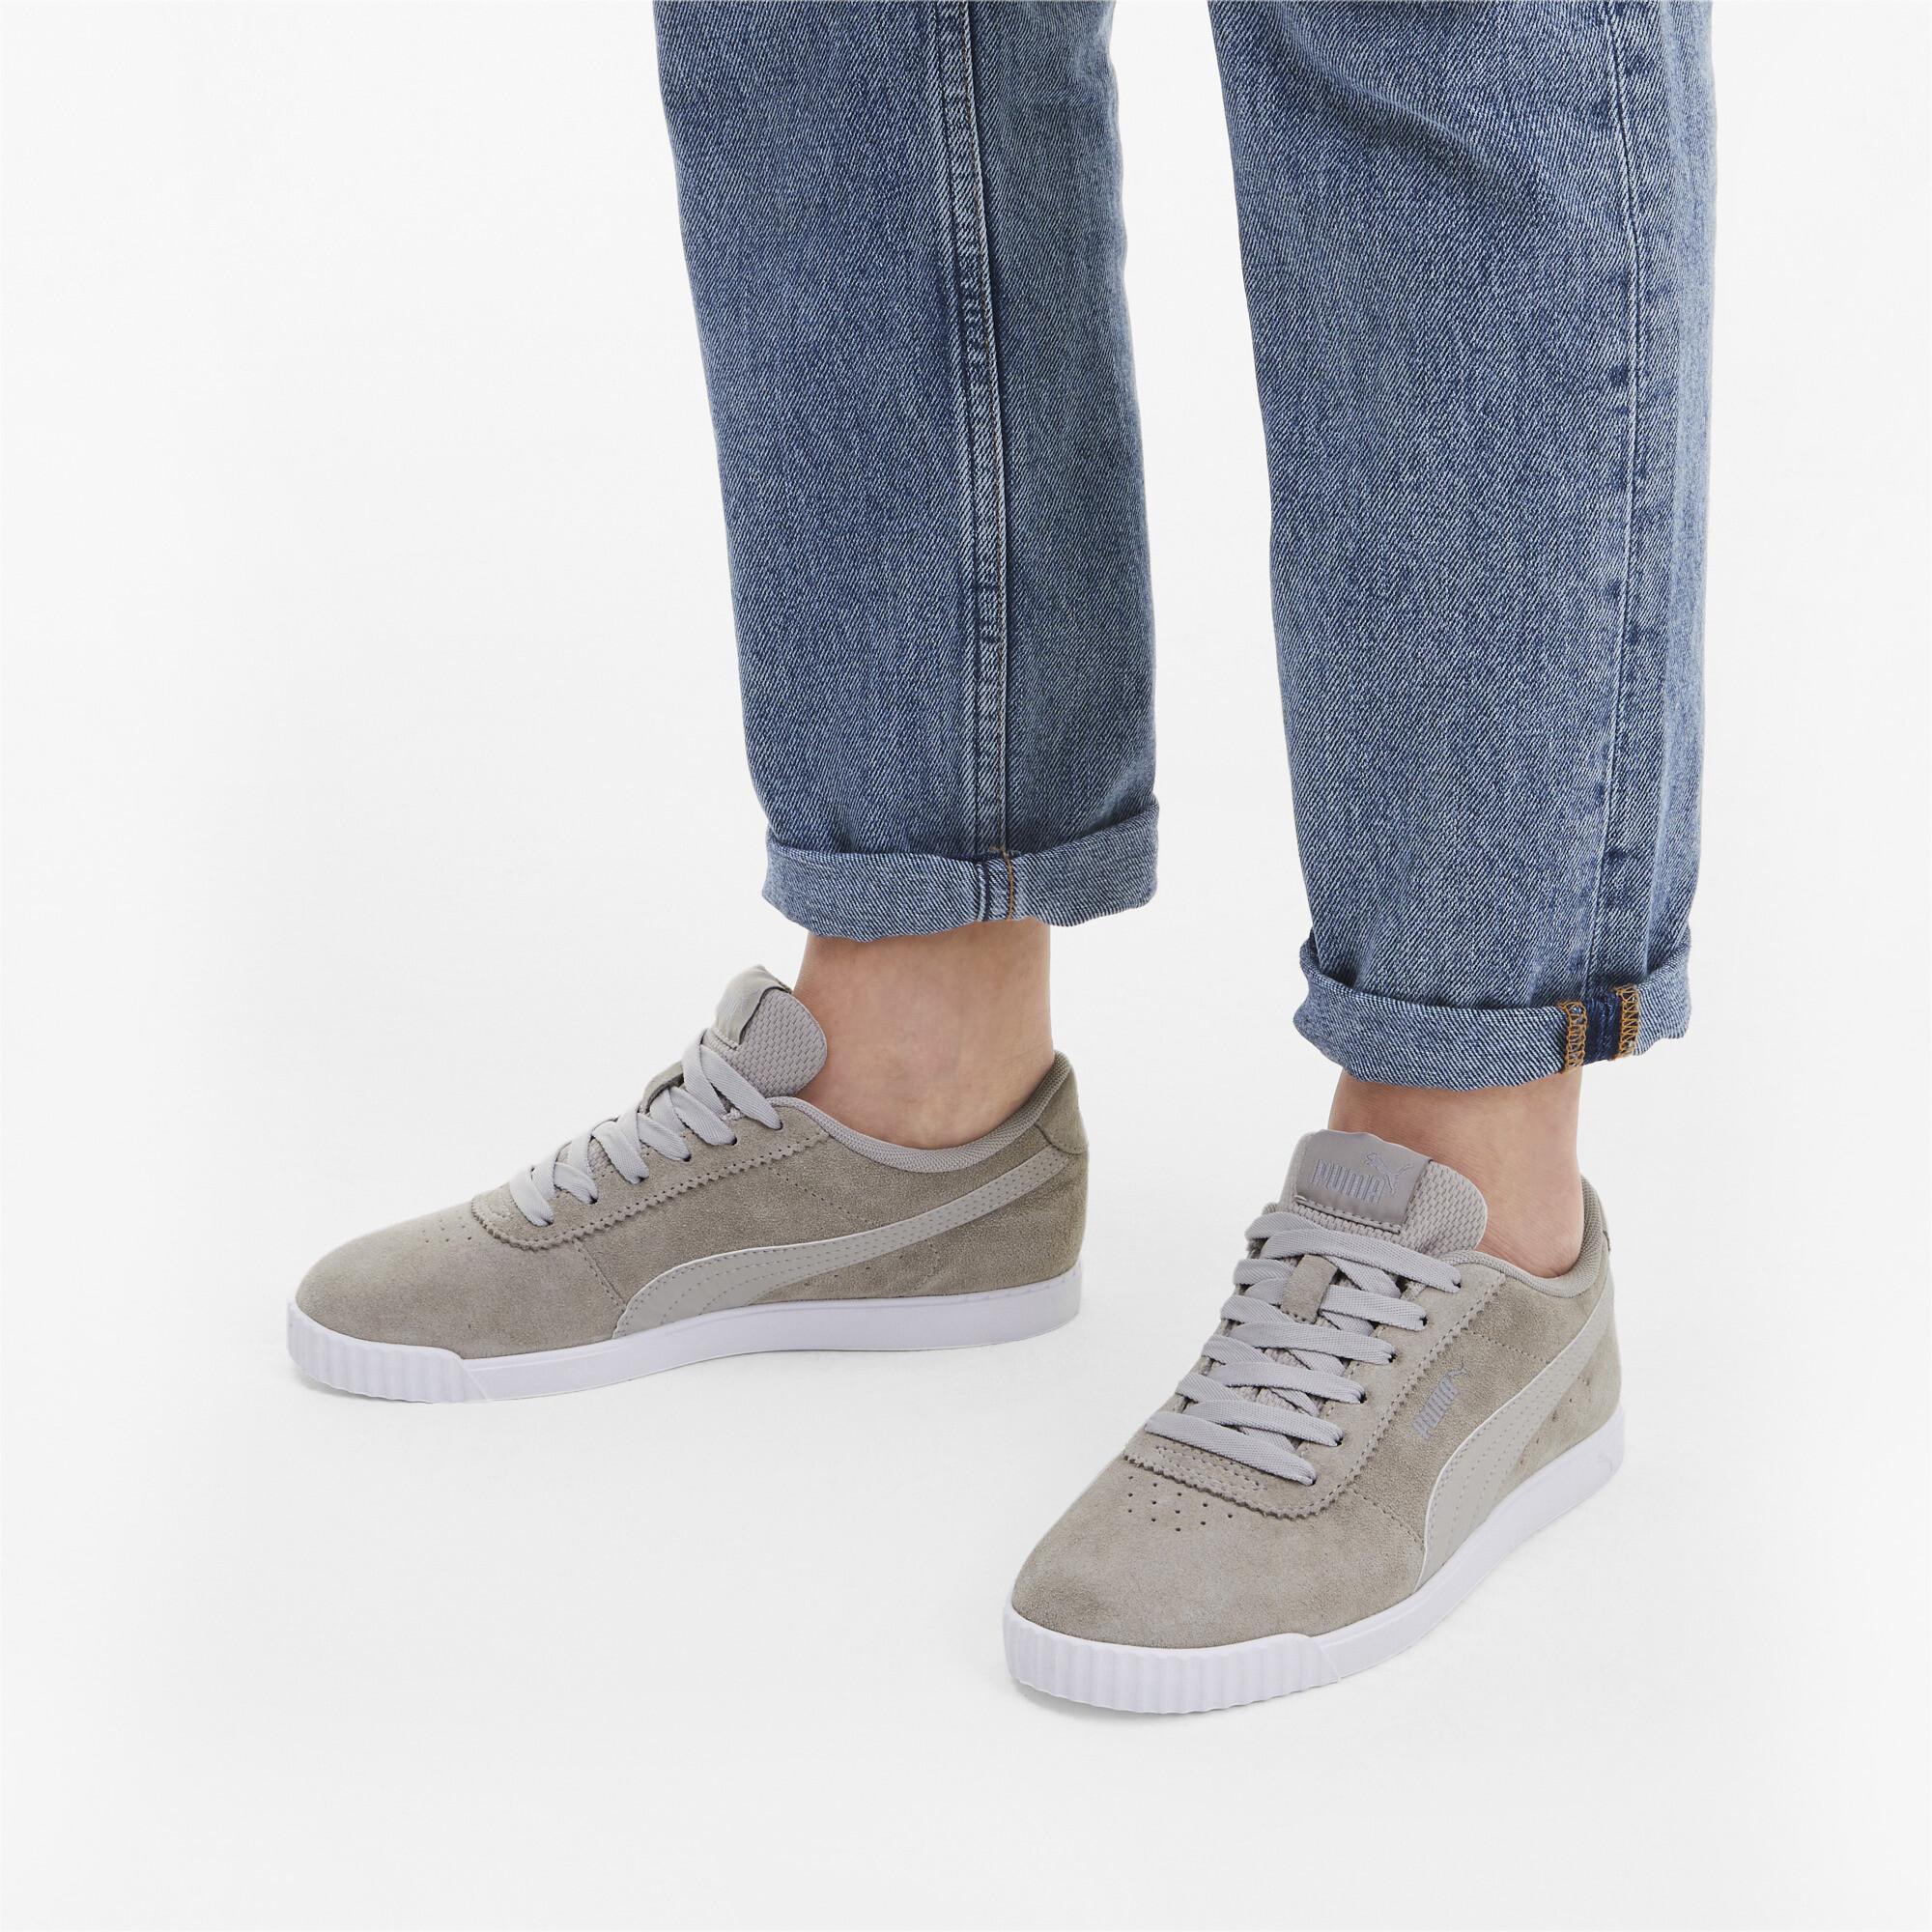 PUMA-Women-039-s-Carina-Slim-Suede-Sneakers thumbnail 5